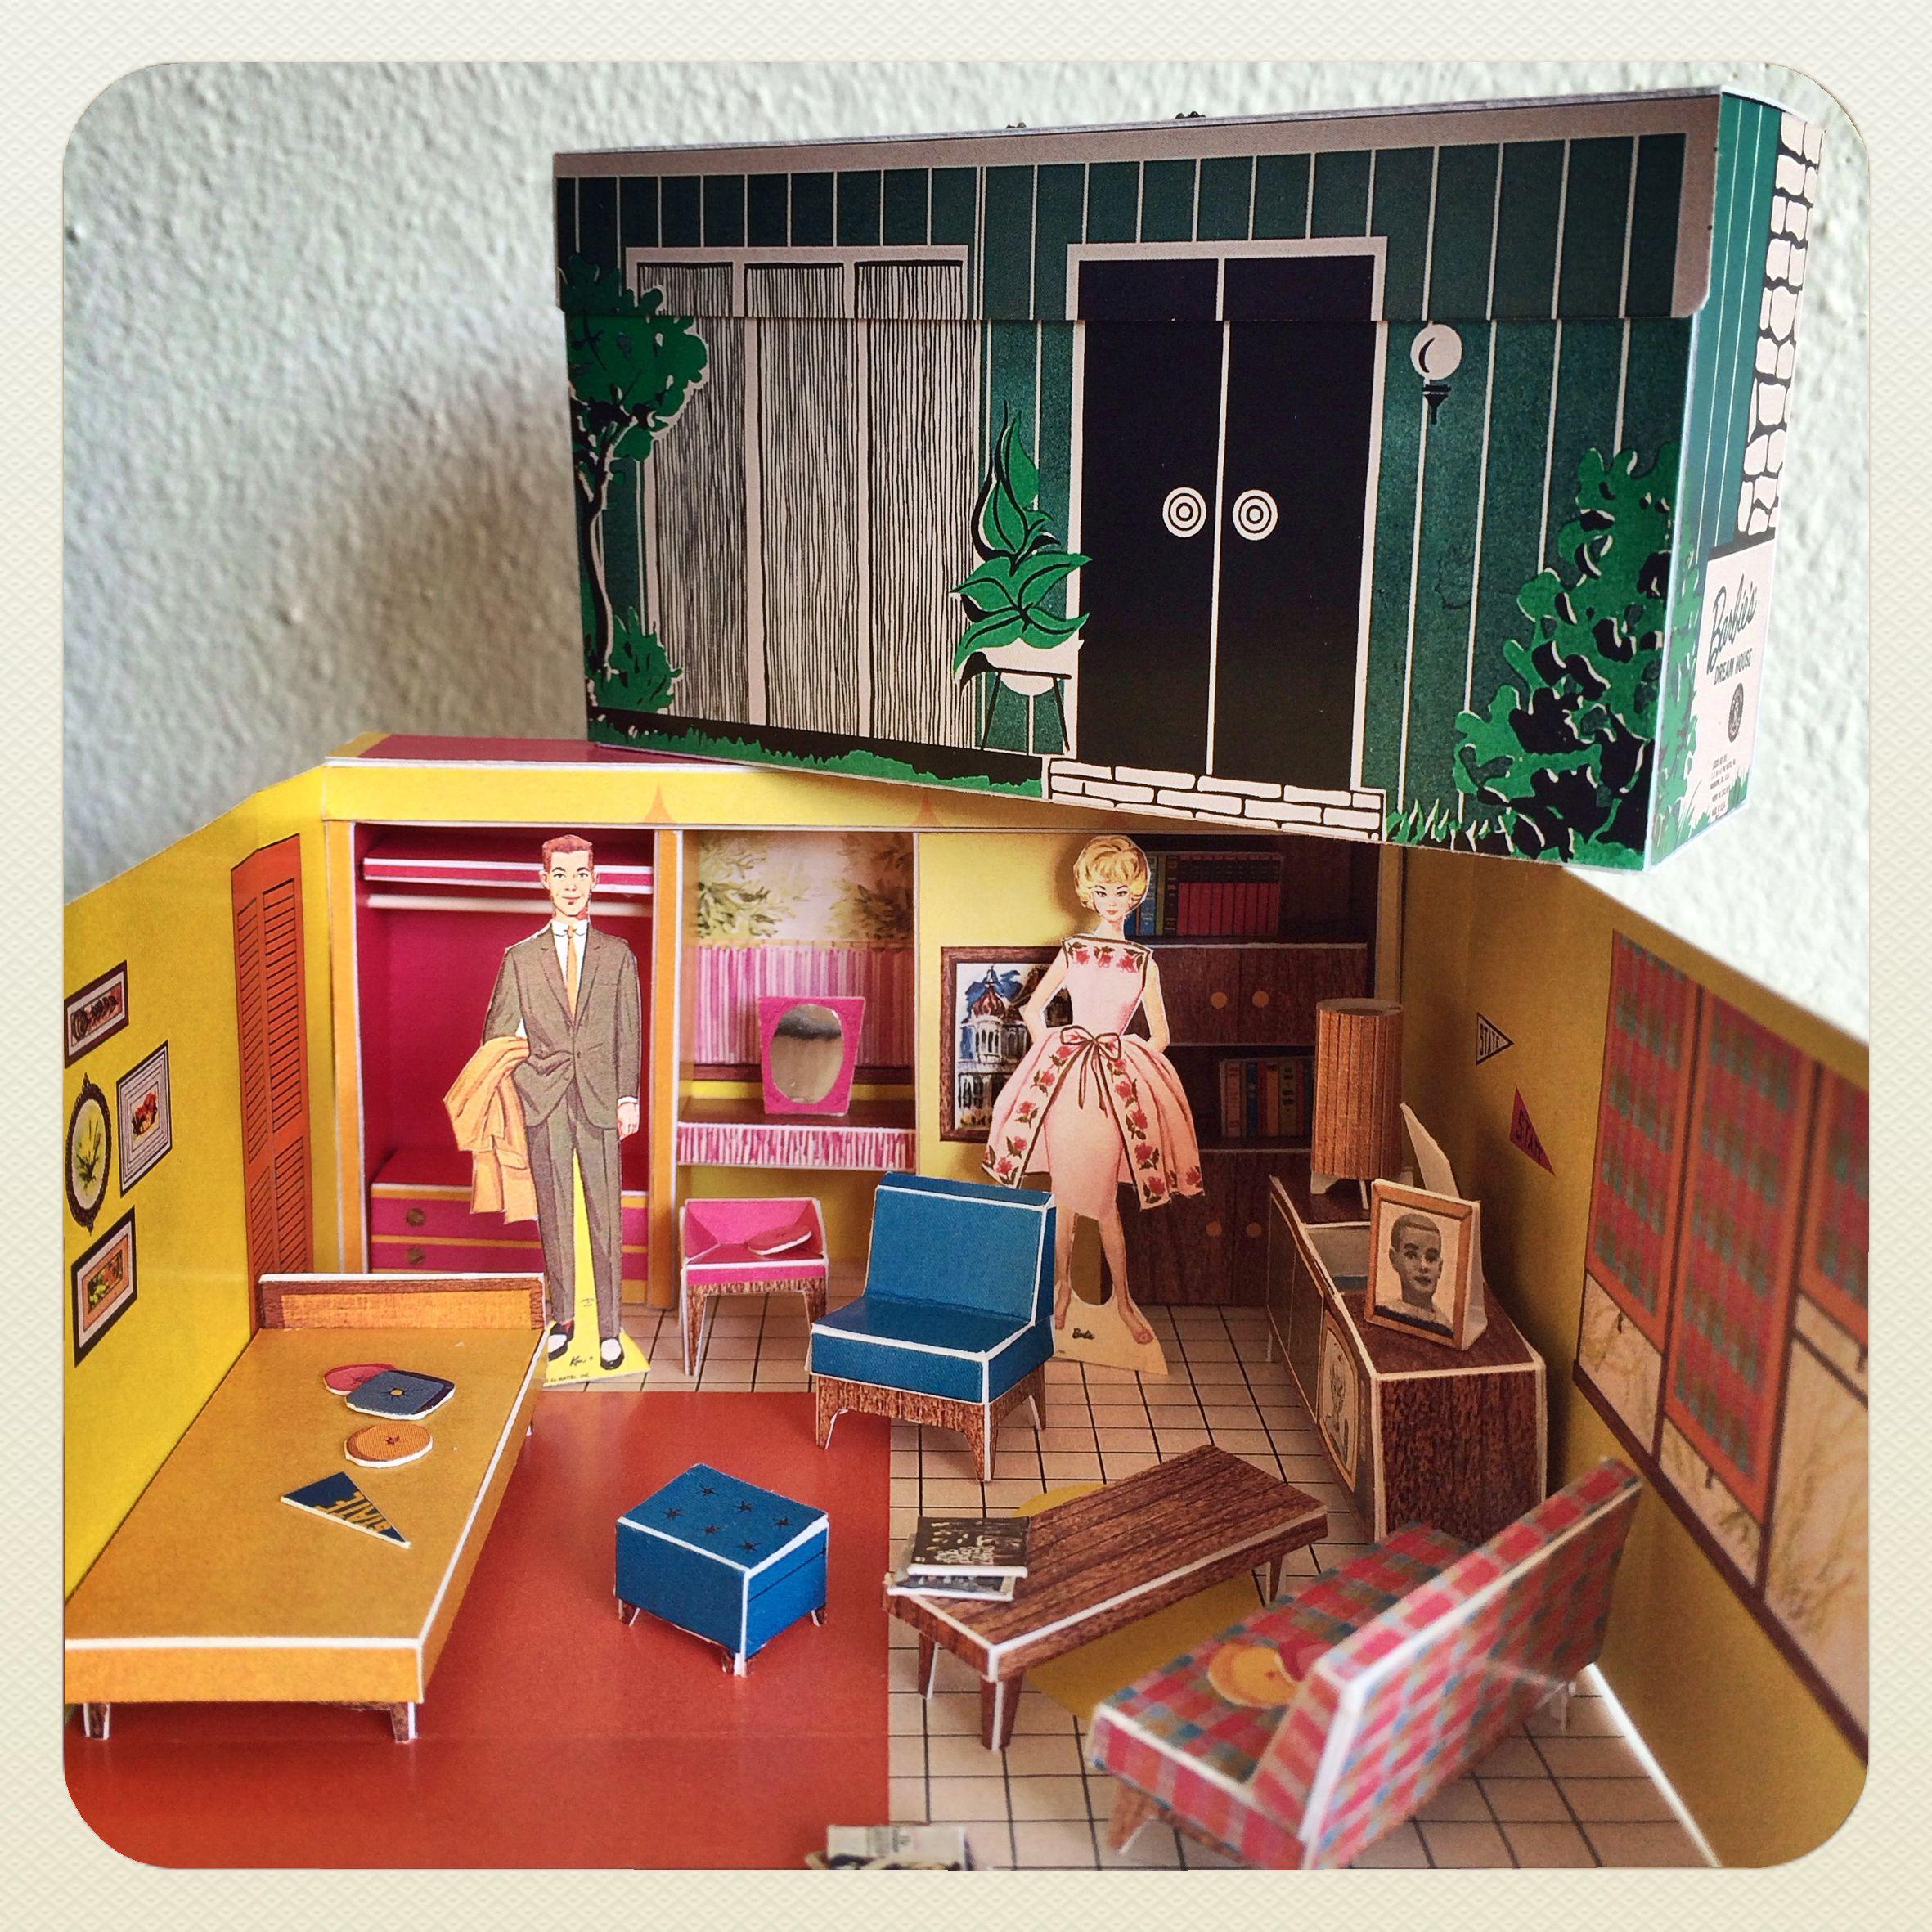 Barbie And Ken In Their Dreamhouse Barbie Dream House Vintage